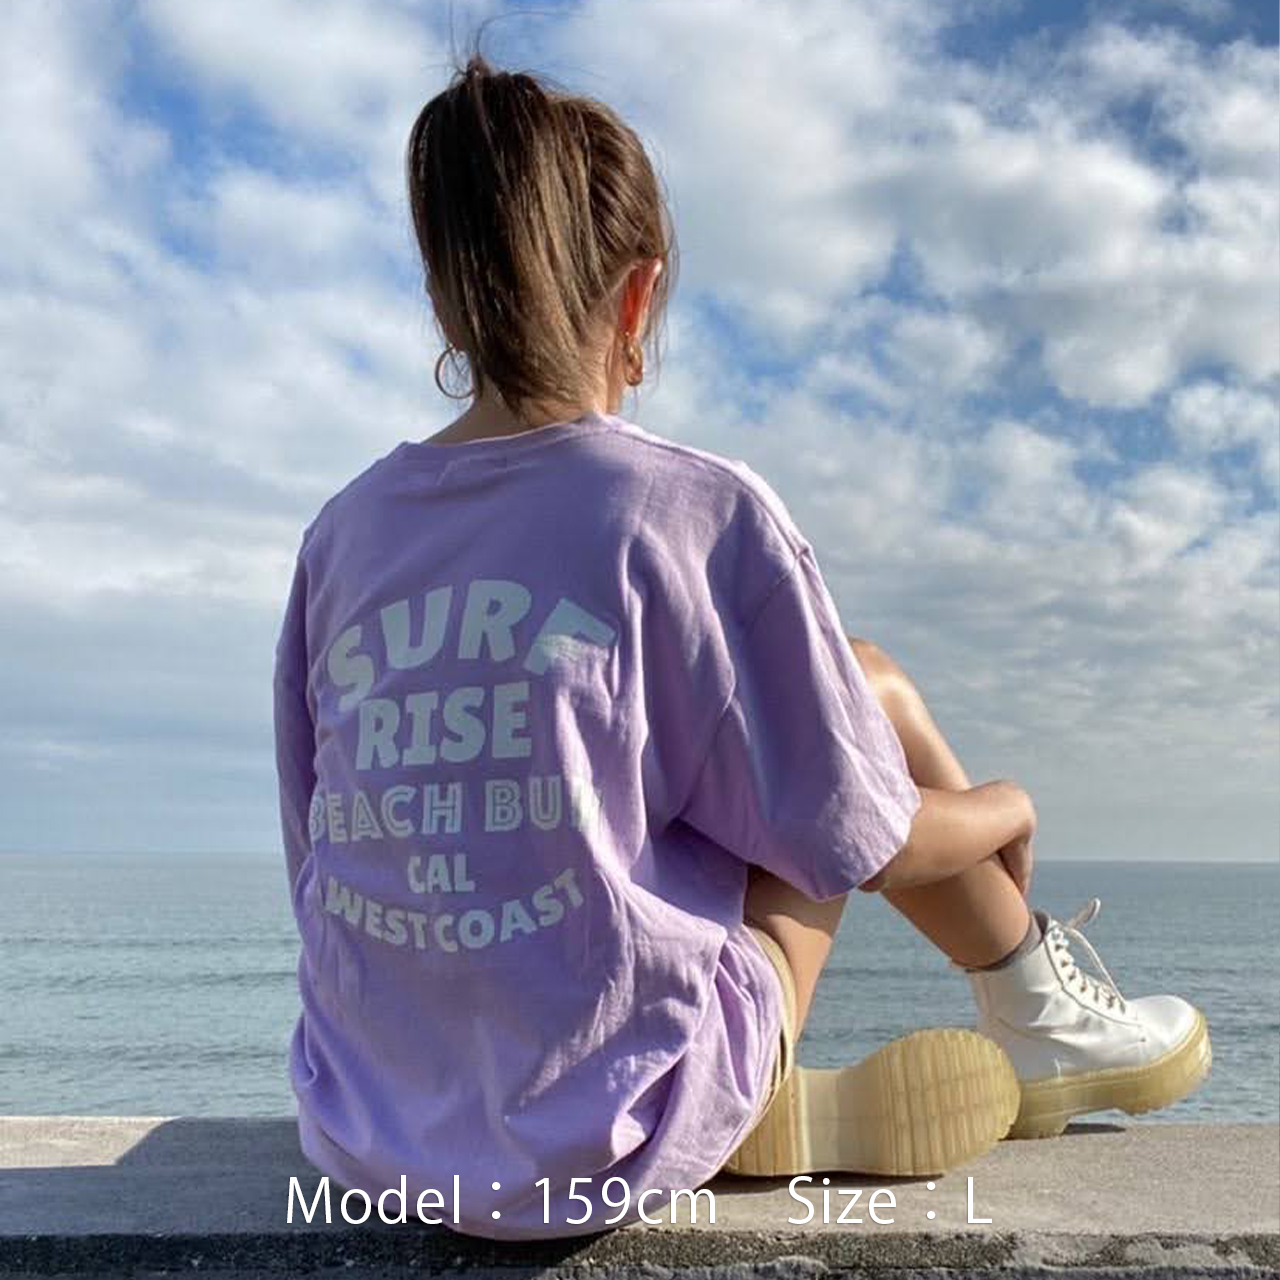 BEACH BUM Tee - Light purple